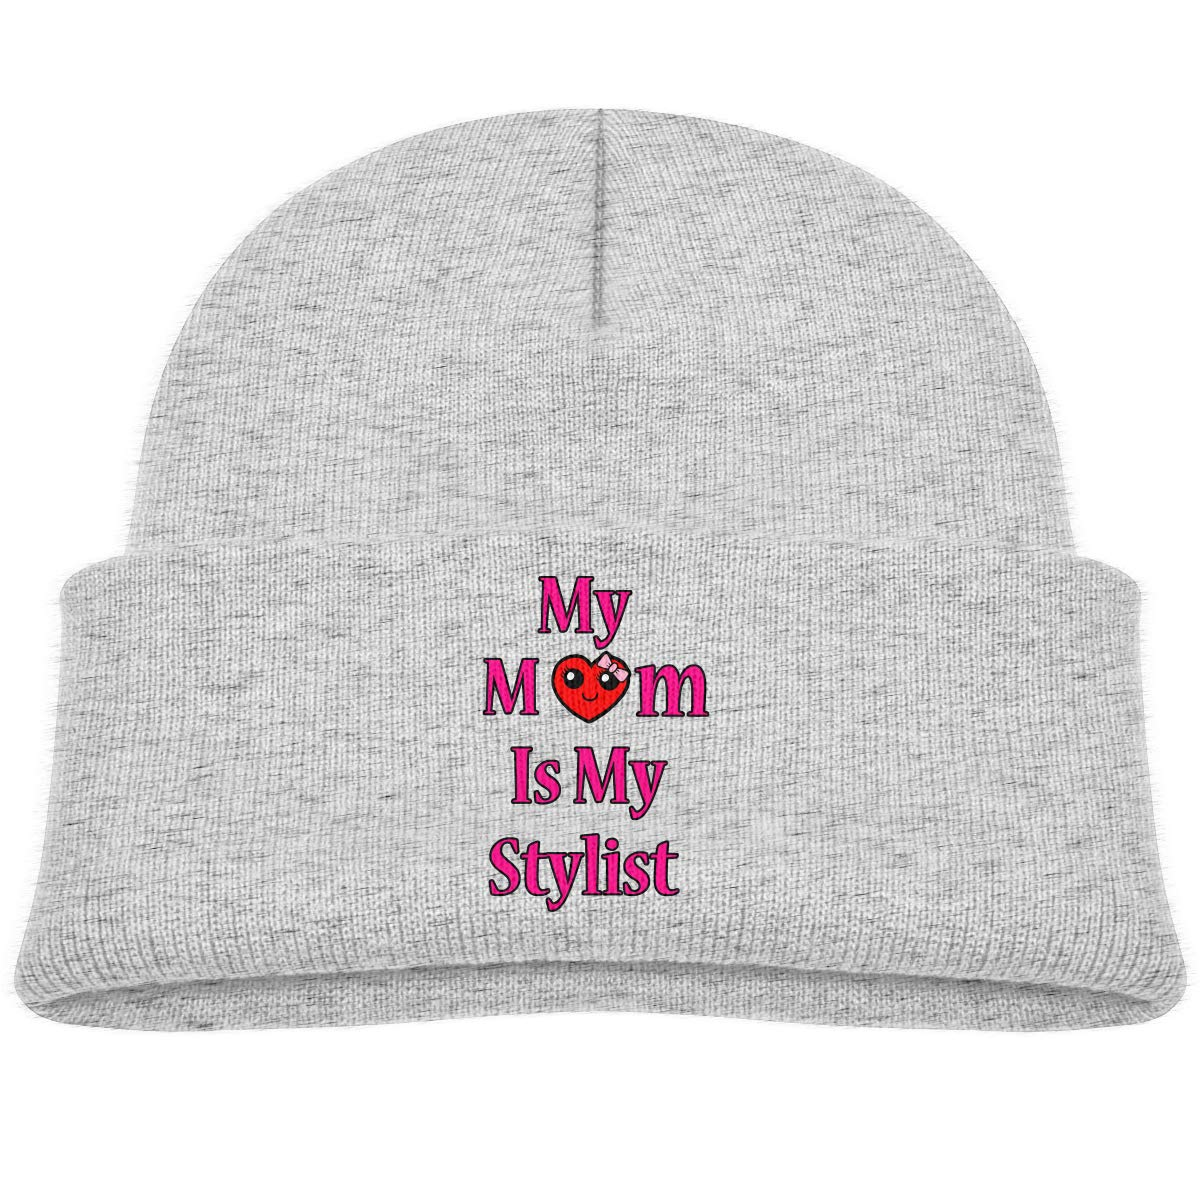 My Mom is My Stylist Knitted Hat Classic Skull Beanies Boys Girls Cuffed Plain Cap